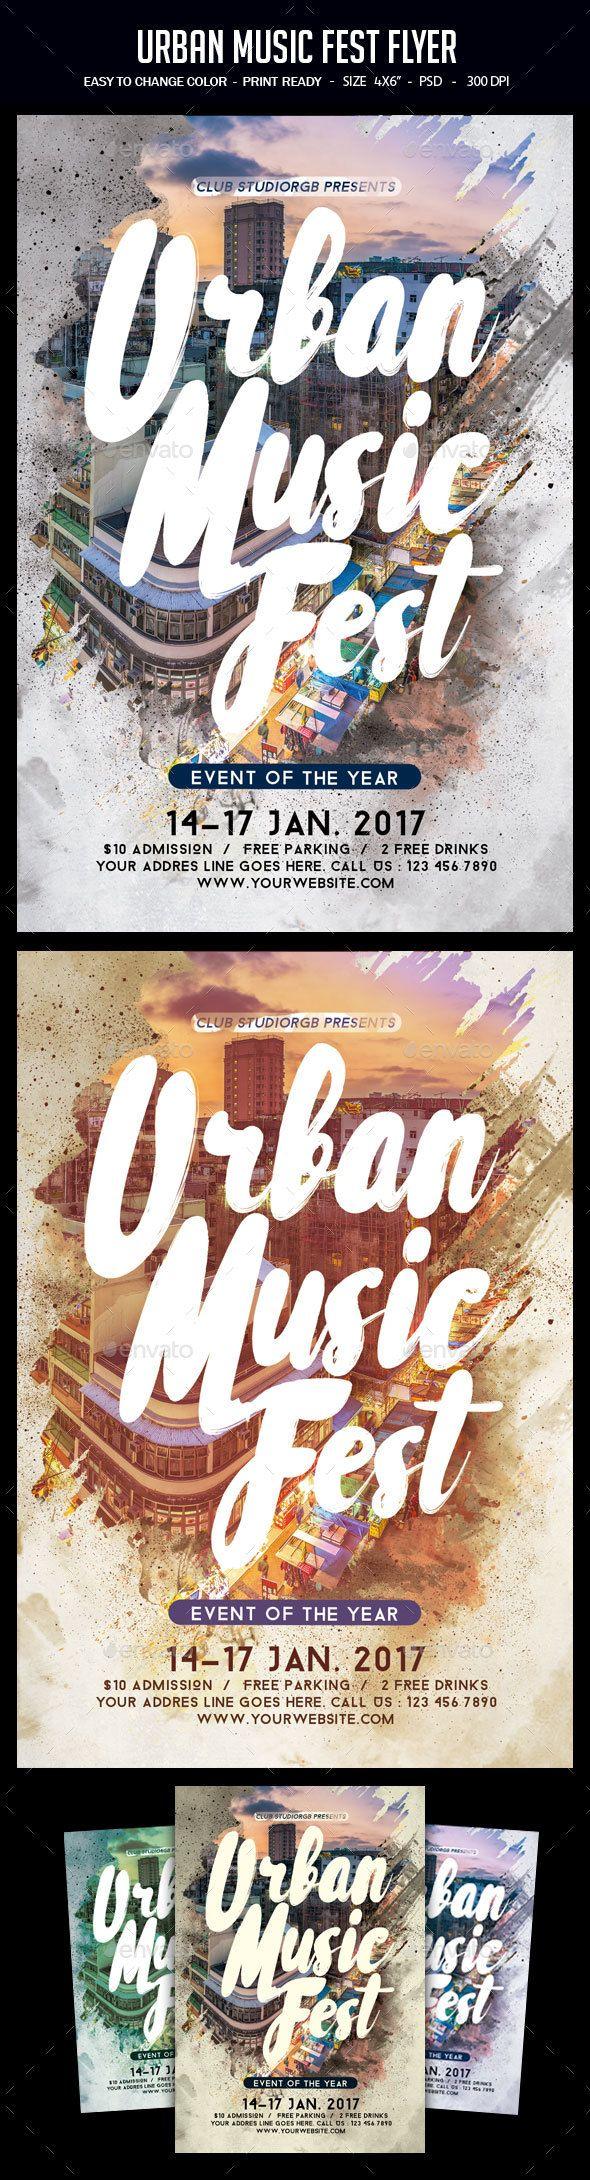 Urban Music Fest Flyer